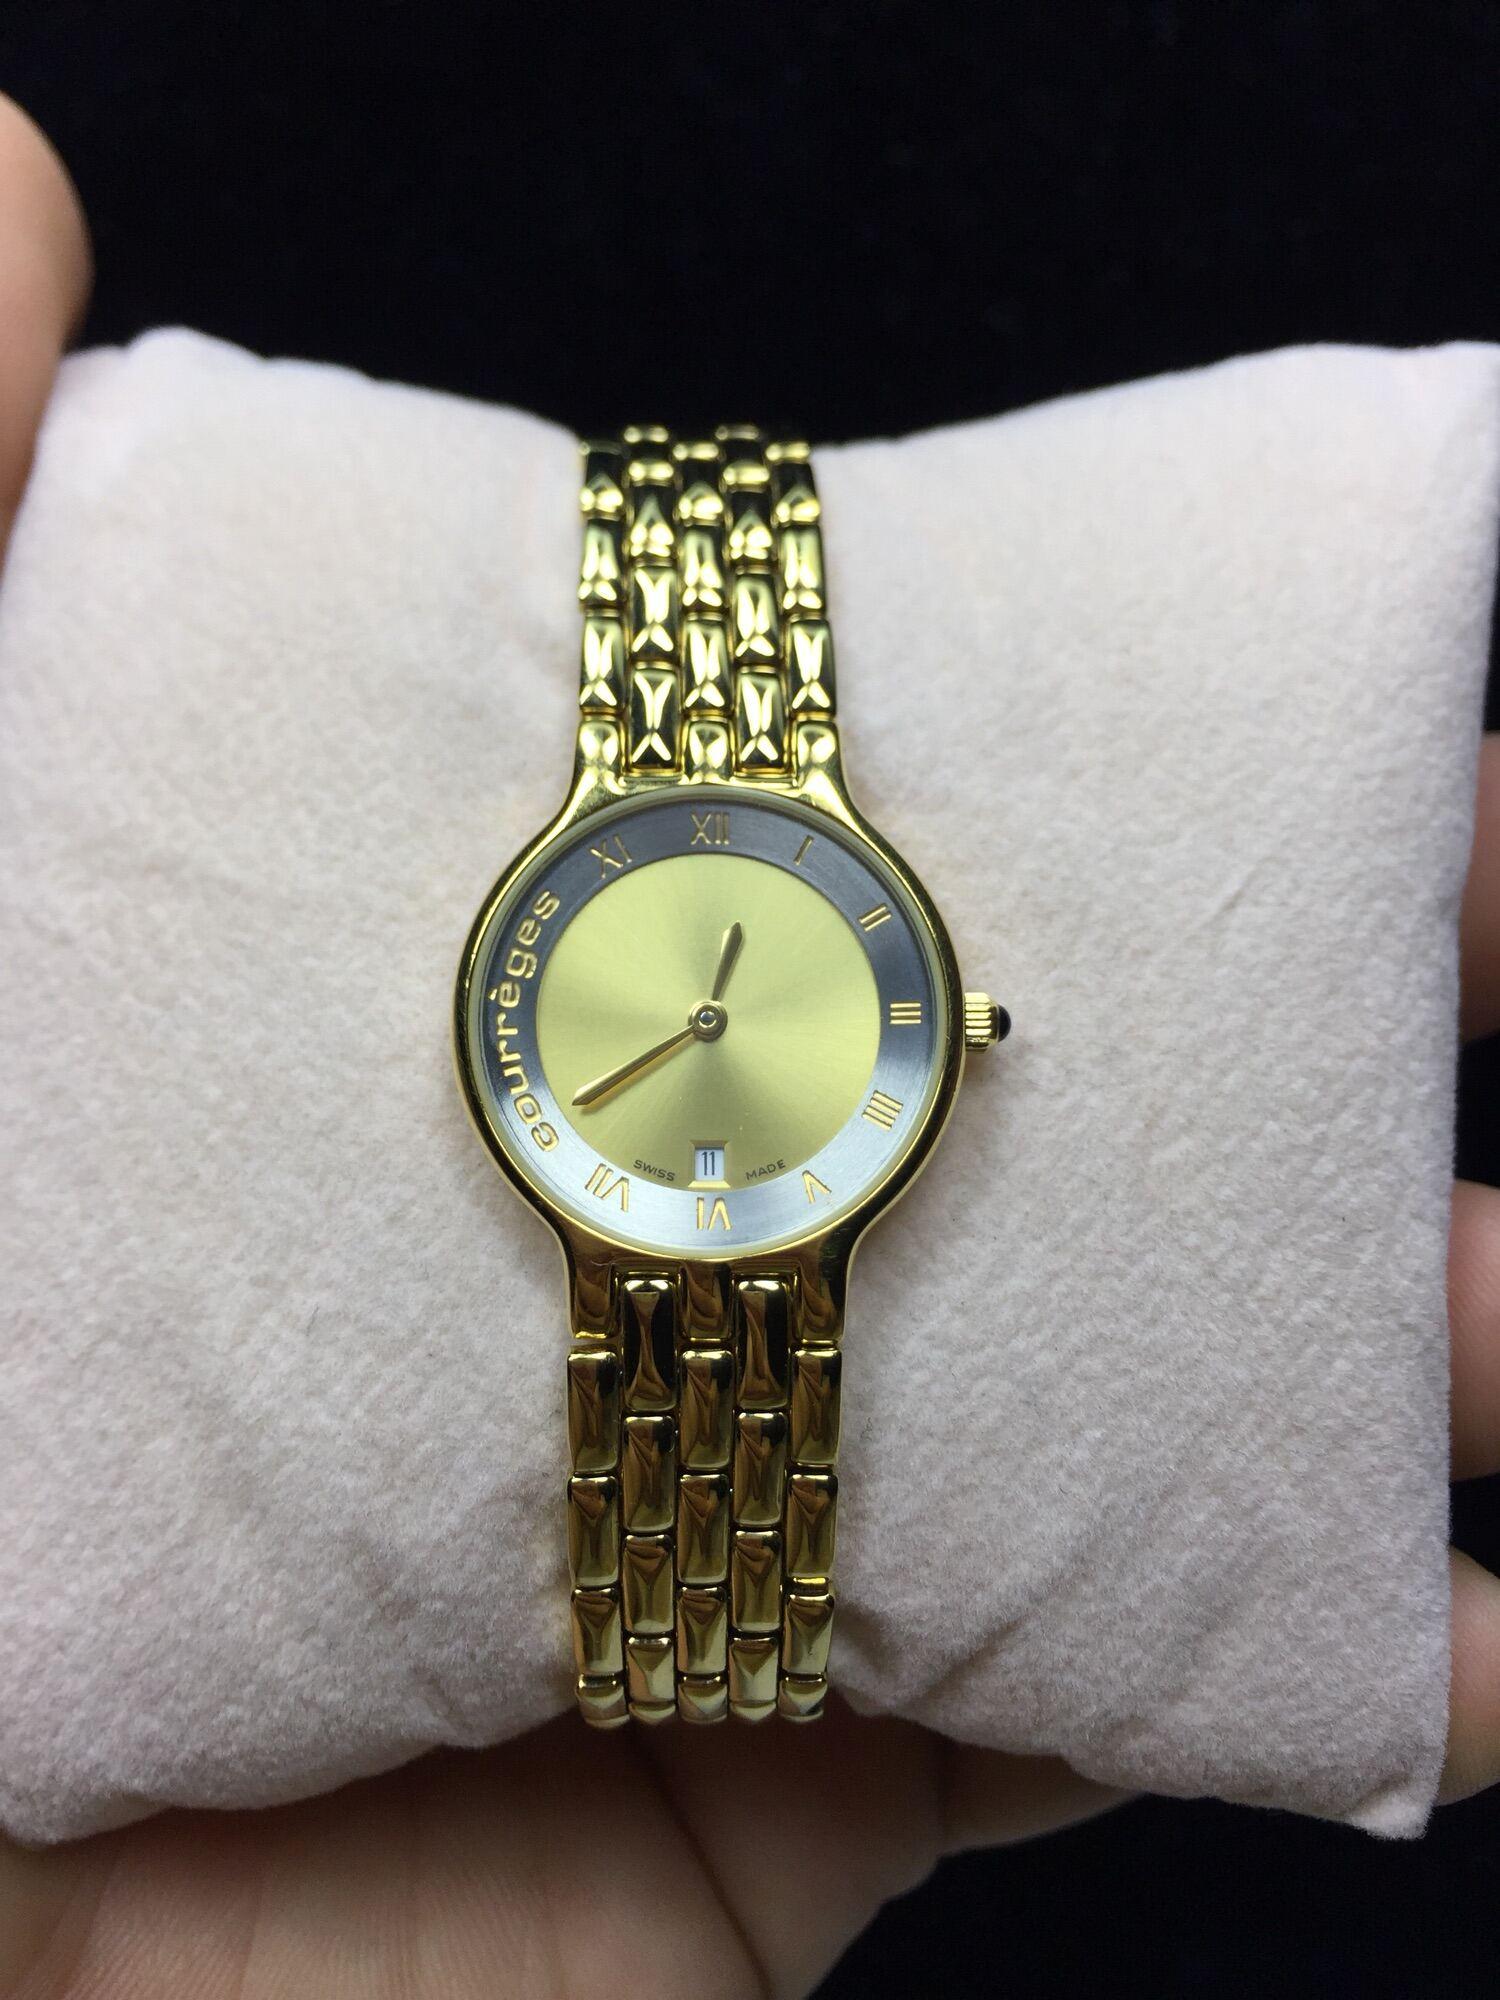 [HCM]Đồng hồ Si Nữ hiệu Courreges Pháp ( Swiss Made )